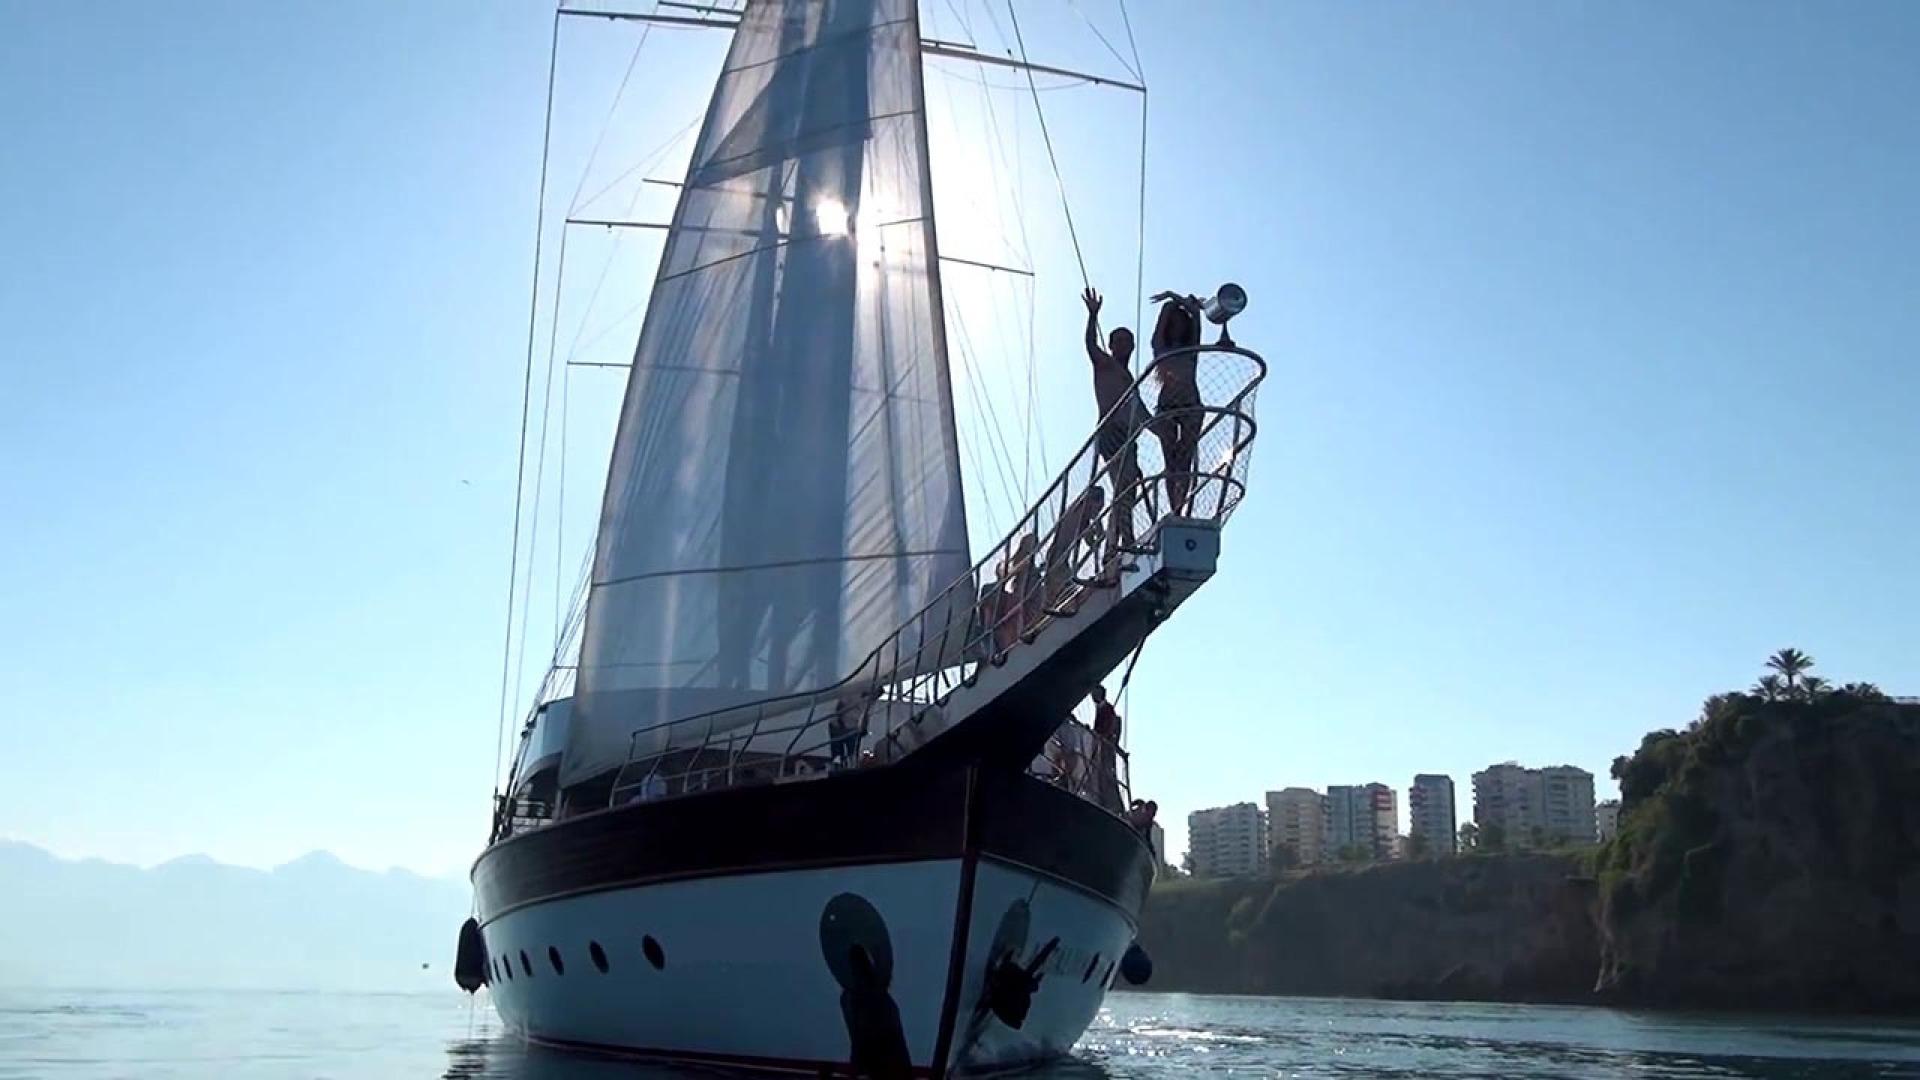 Custom-LZ-140 2009-My Dream Batumi-Georgia-Bow View-1447695 | Thumbnail